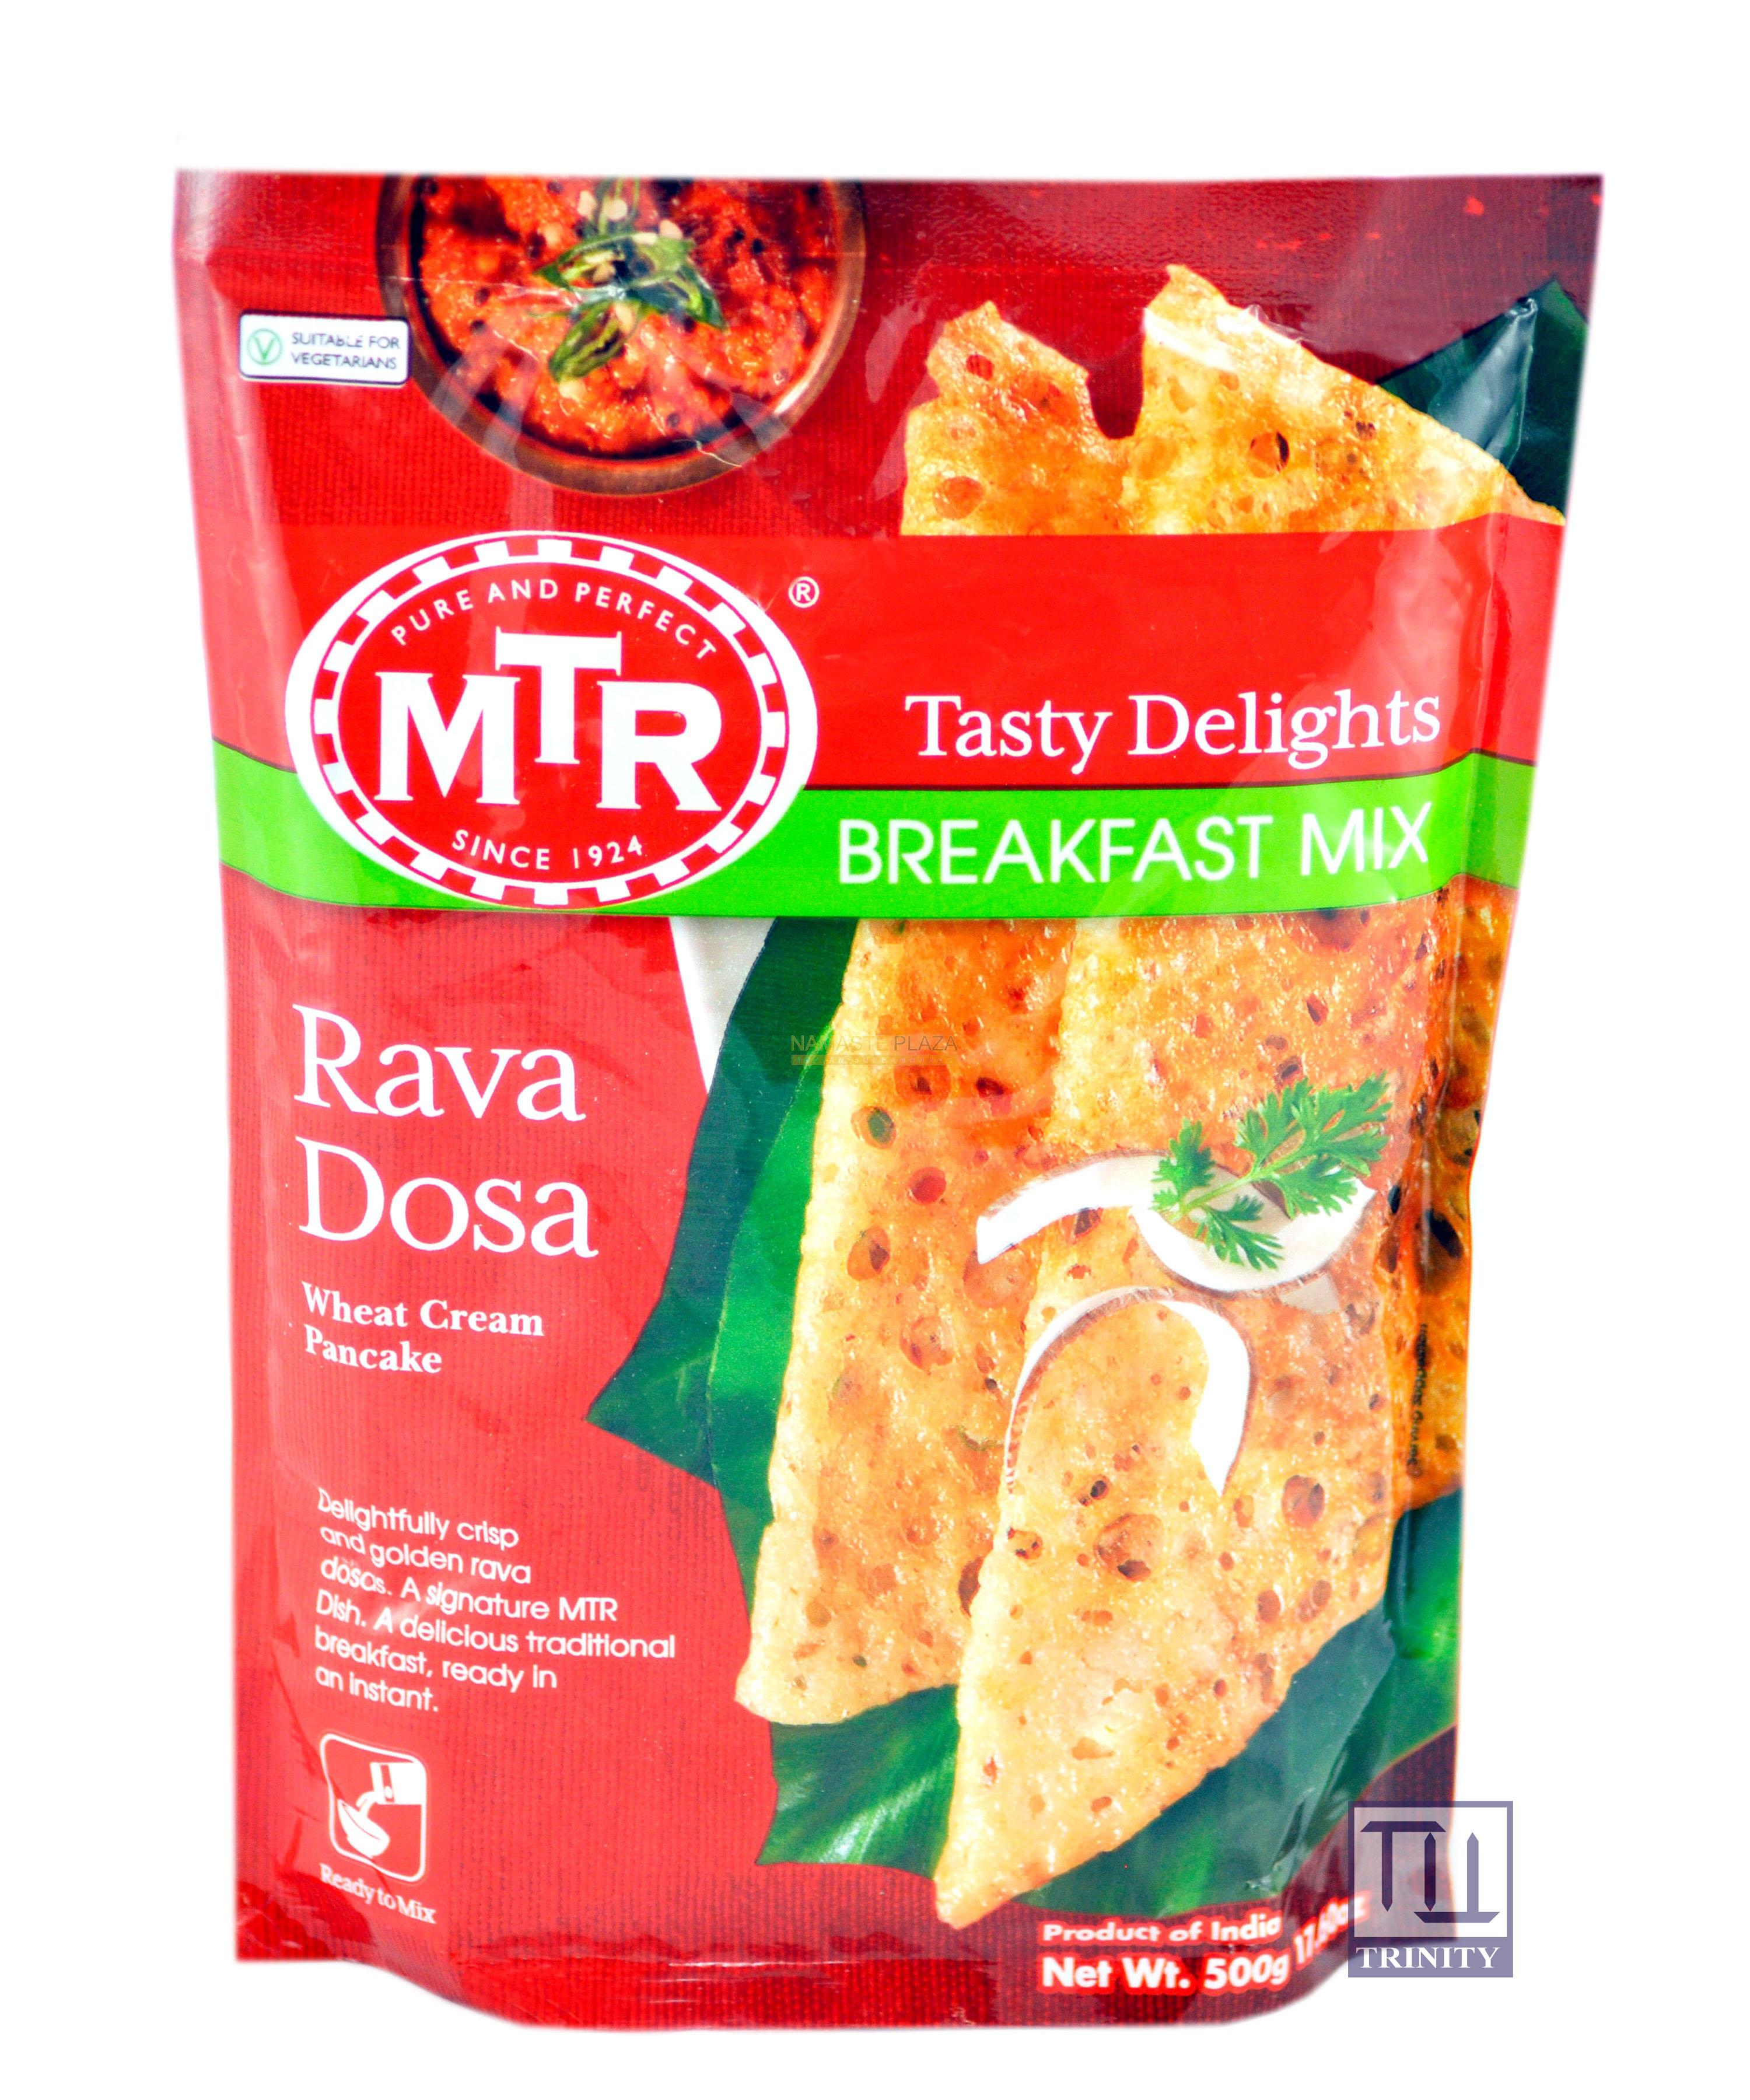 MTR Rava Dosa 印度Rava Dosa 調理粉